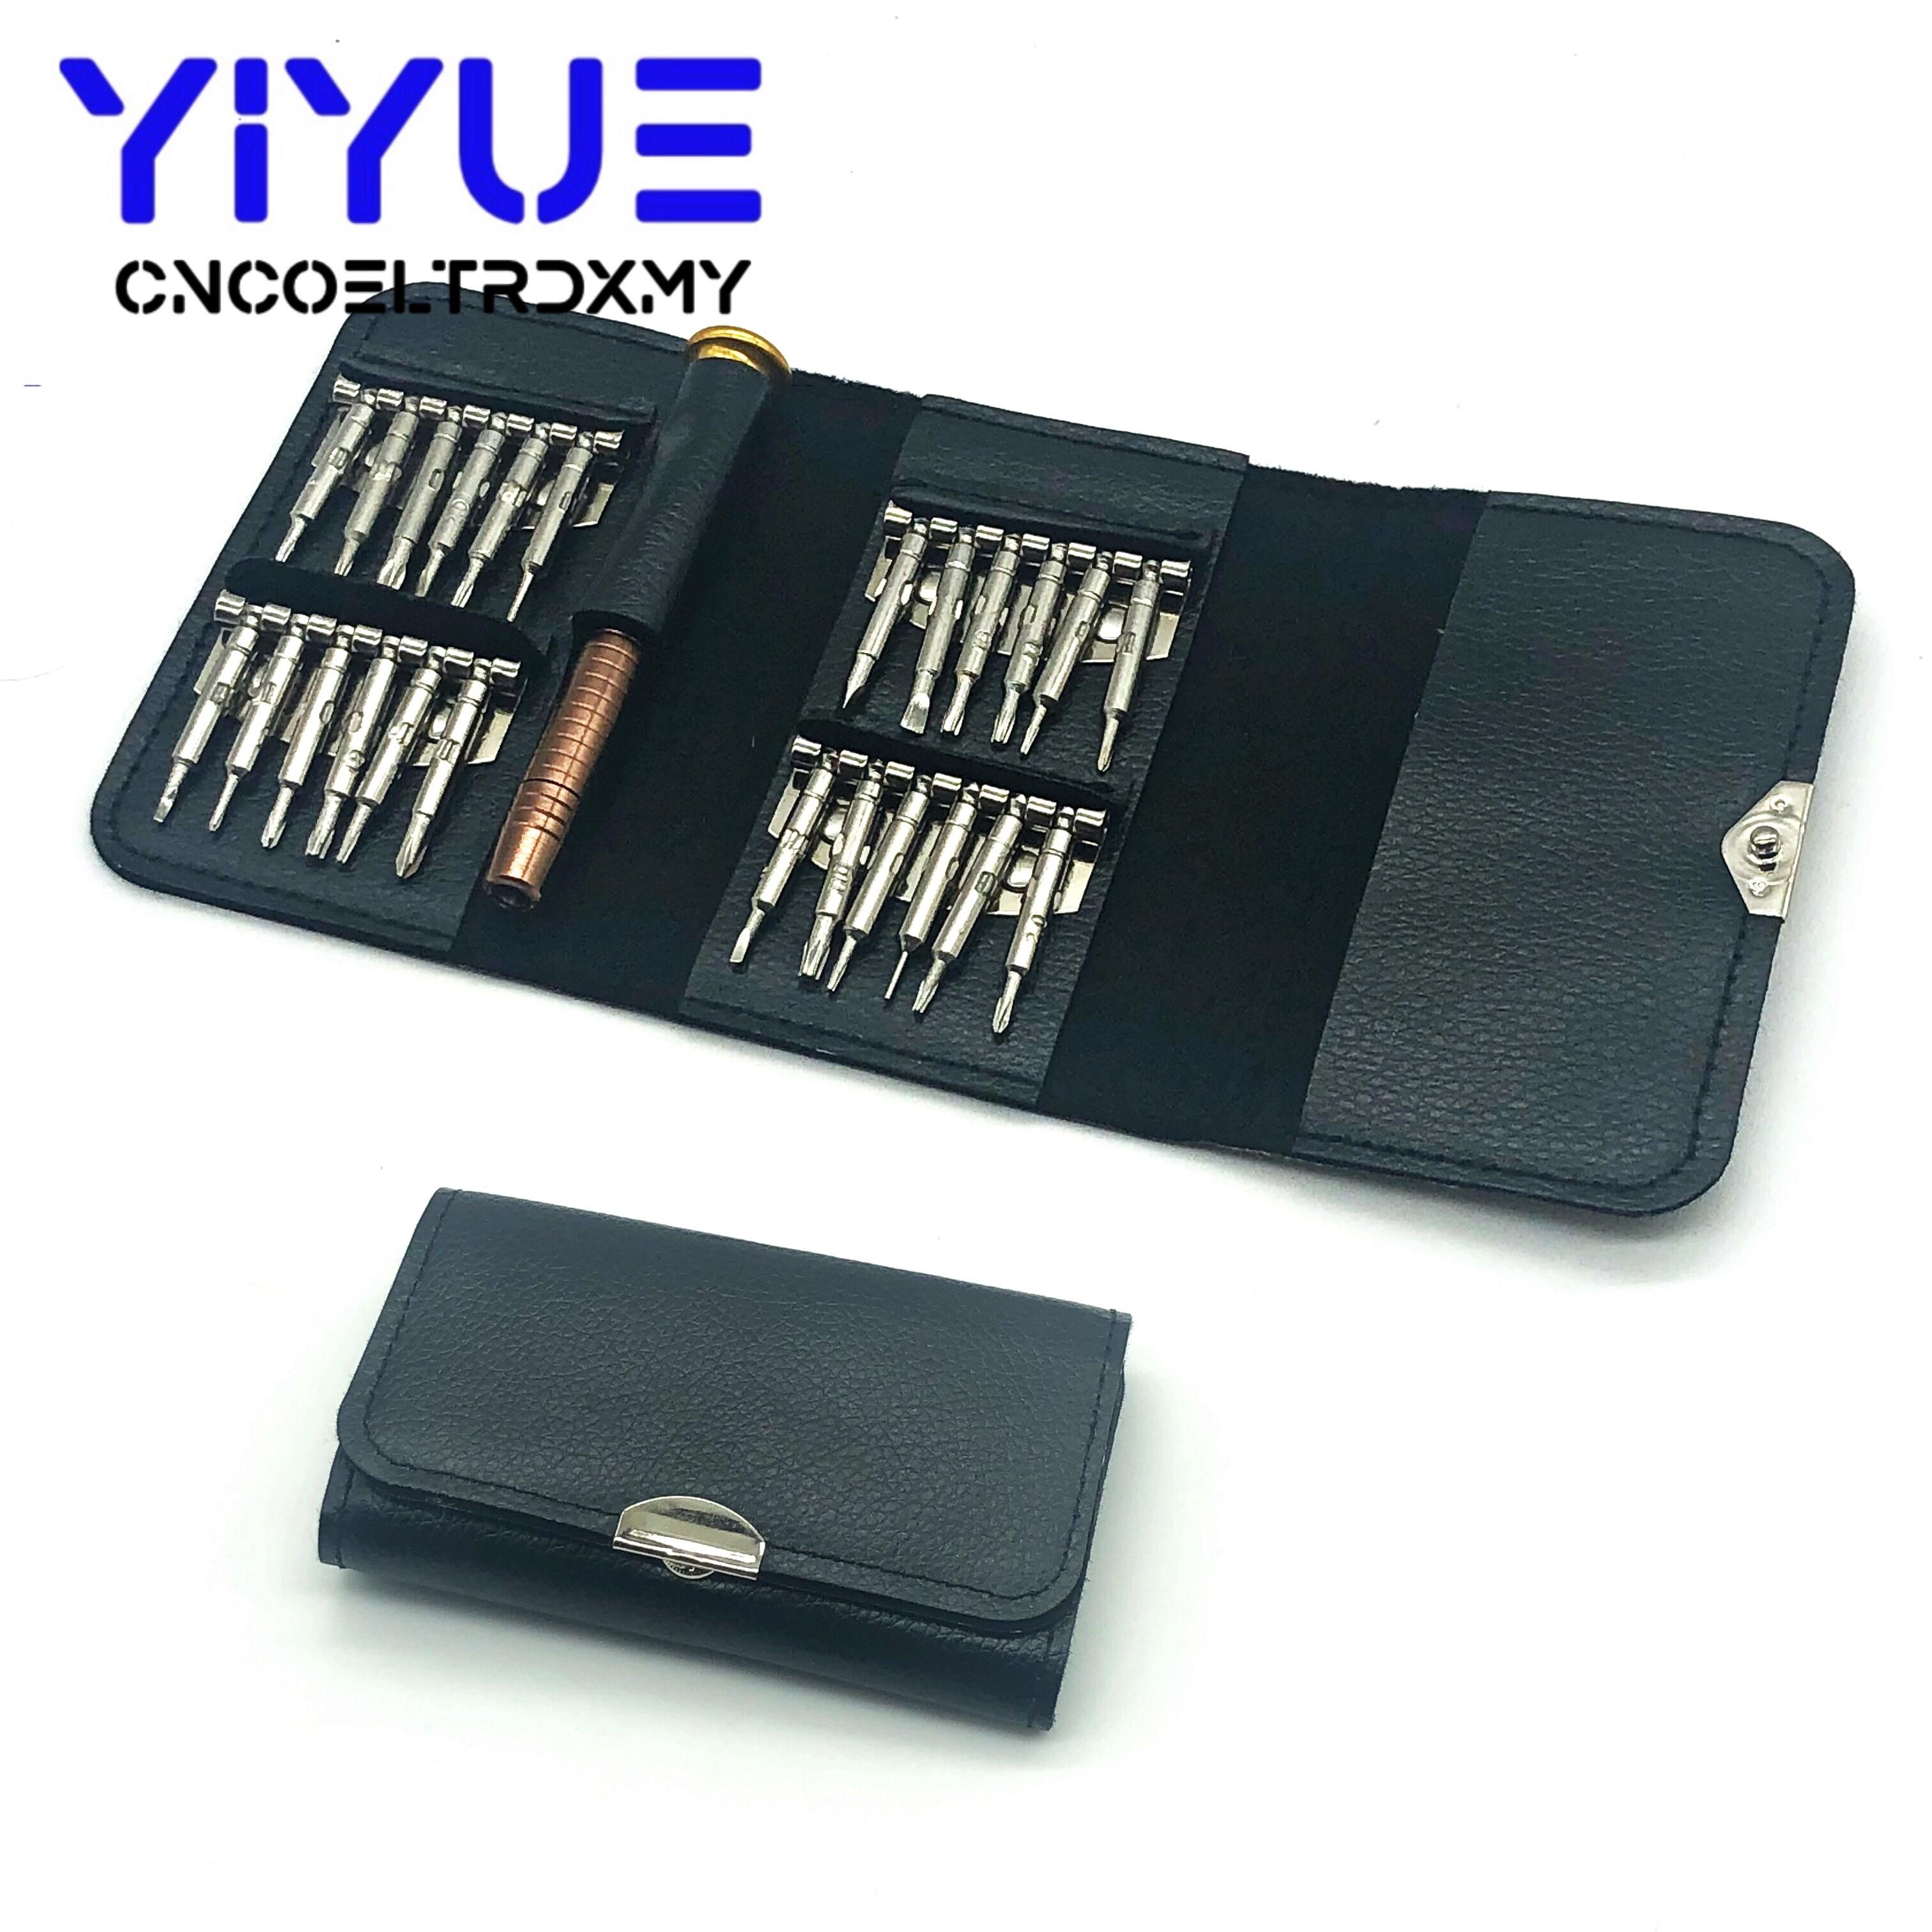 Screwdriver Set 25 In 1 Torx Multifunctional Opening Repair Tool Set Precision Screwdriver For Phones Tablet PC